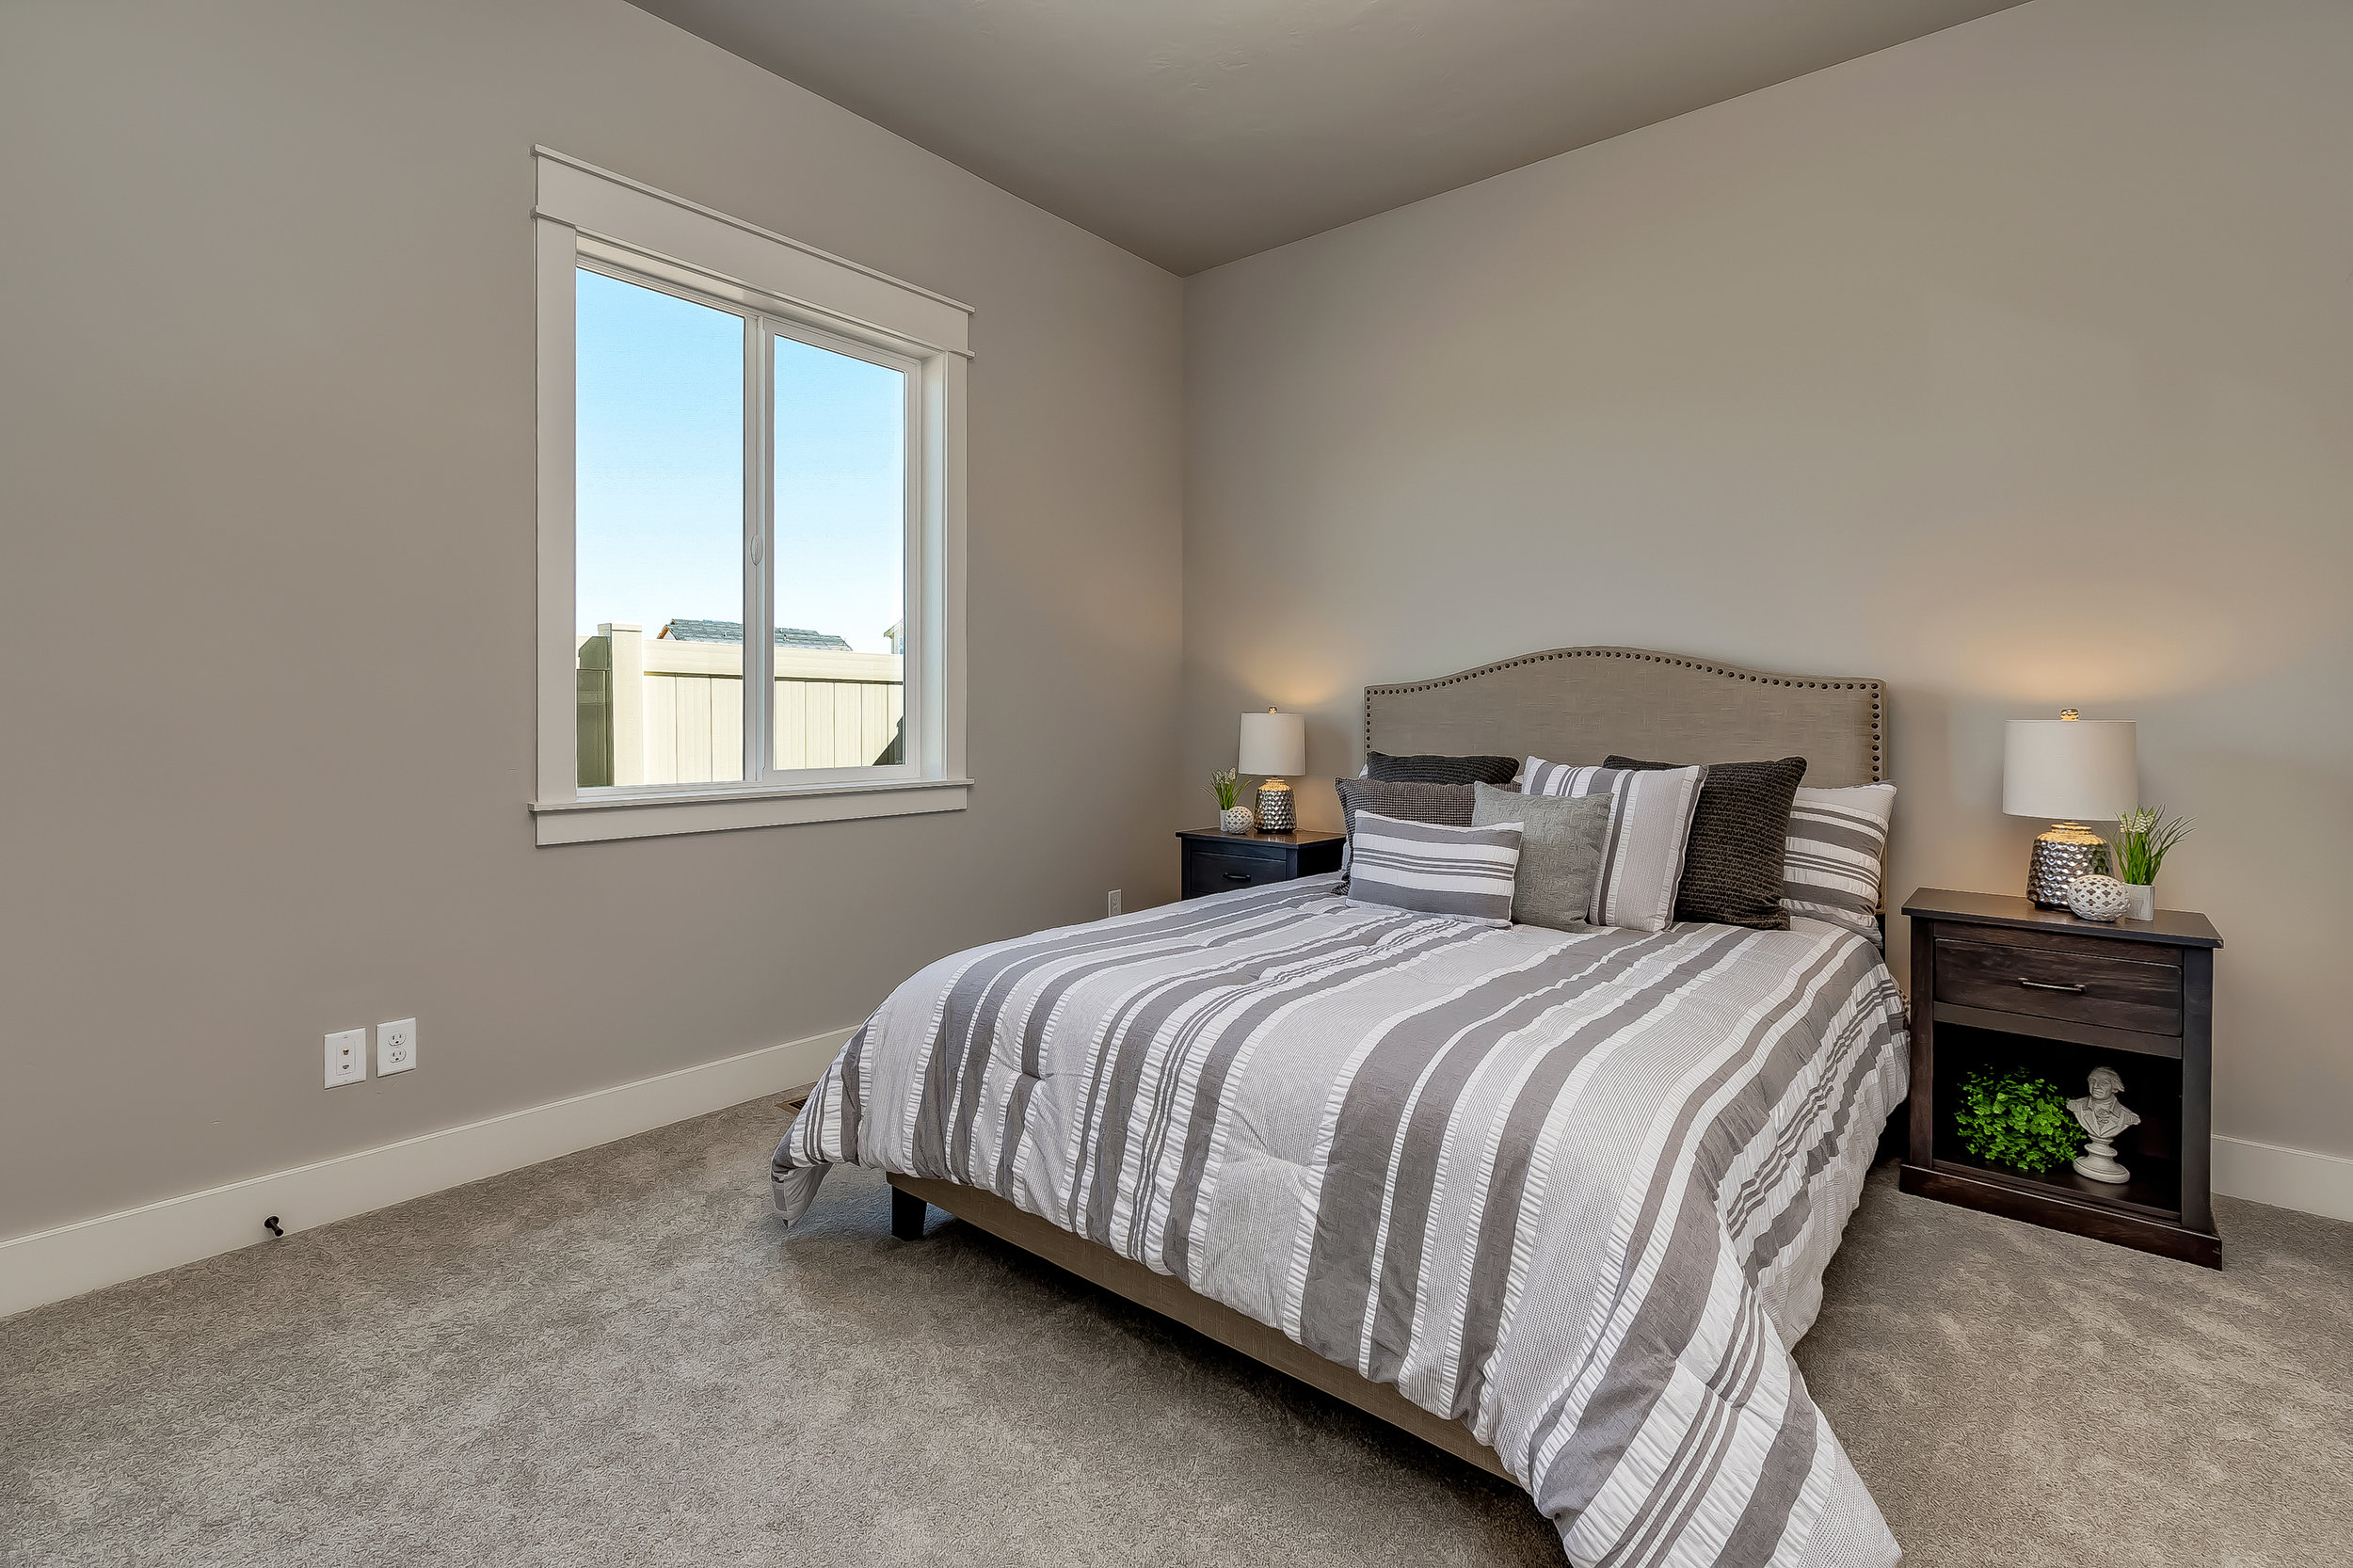 022_Bedroom .jpg